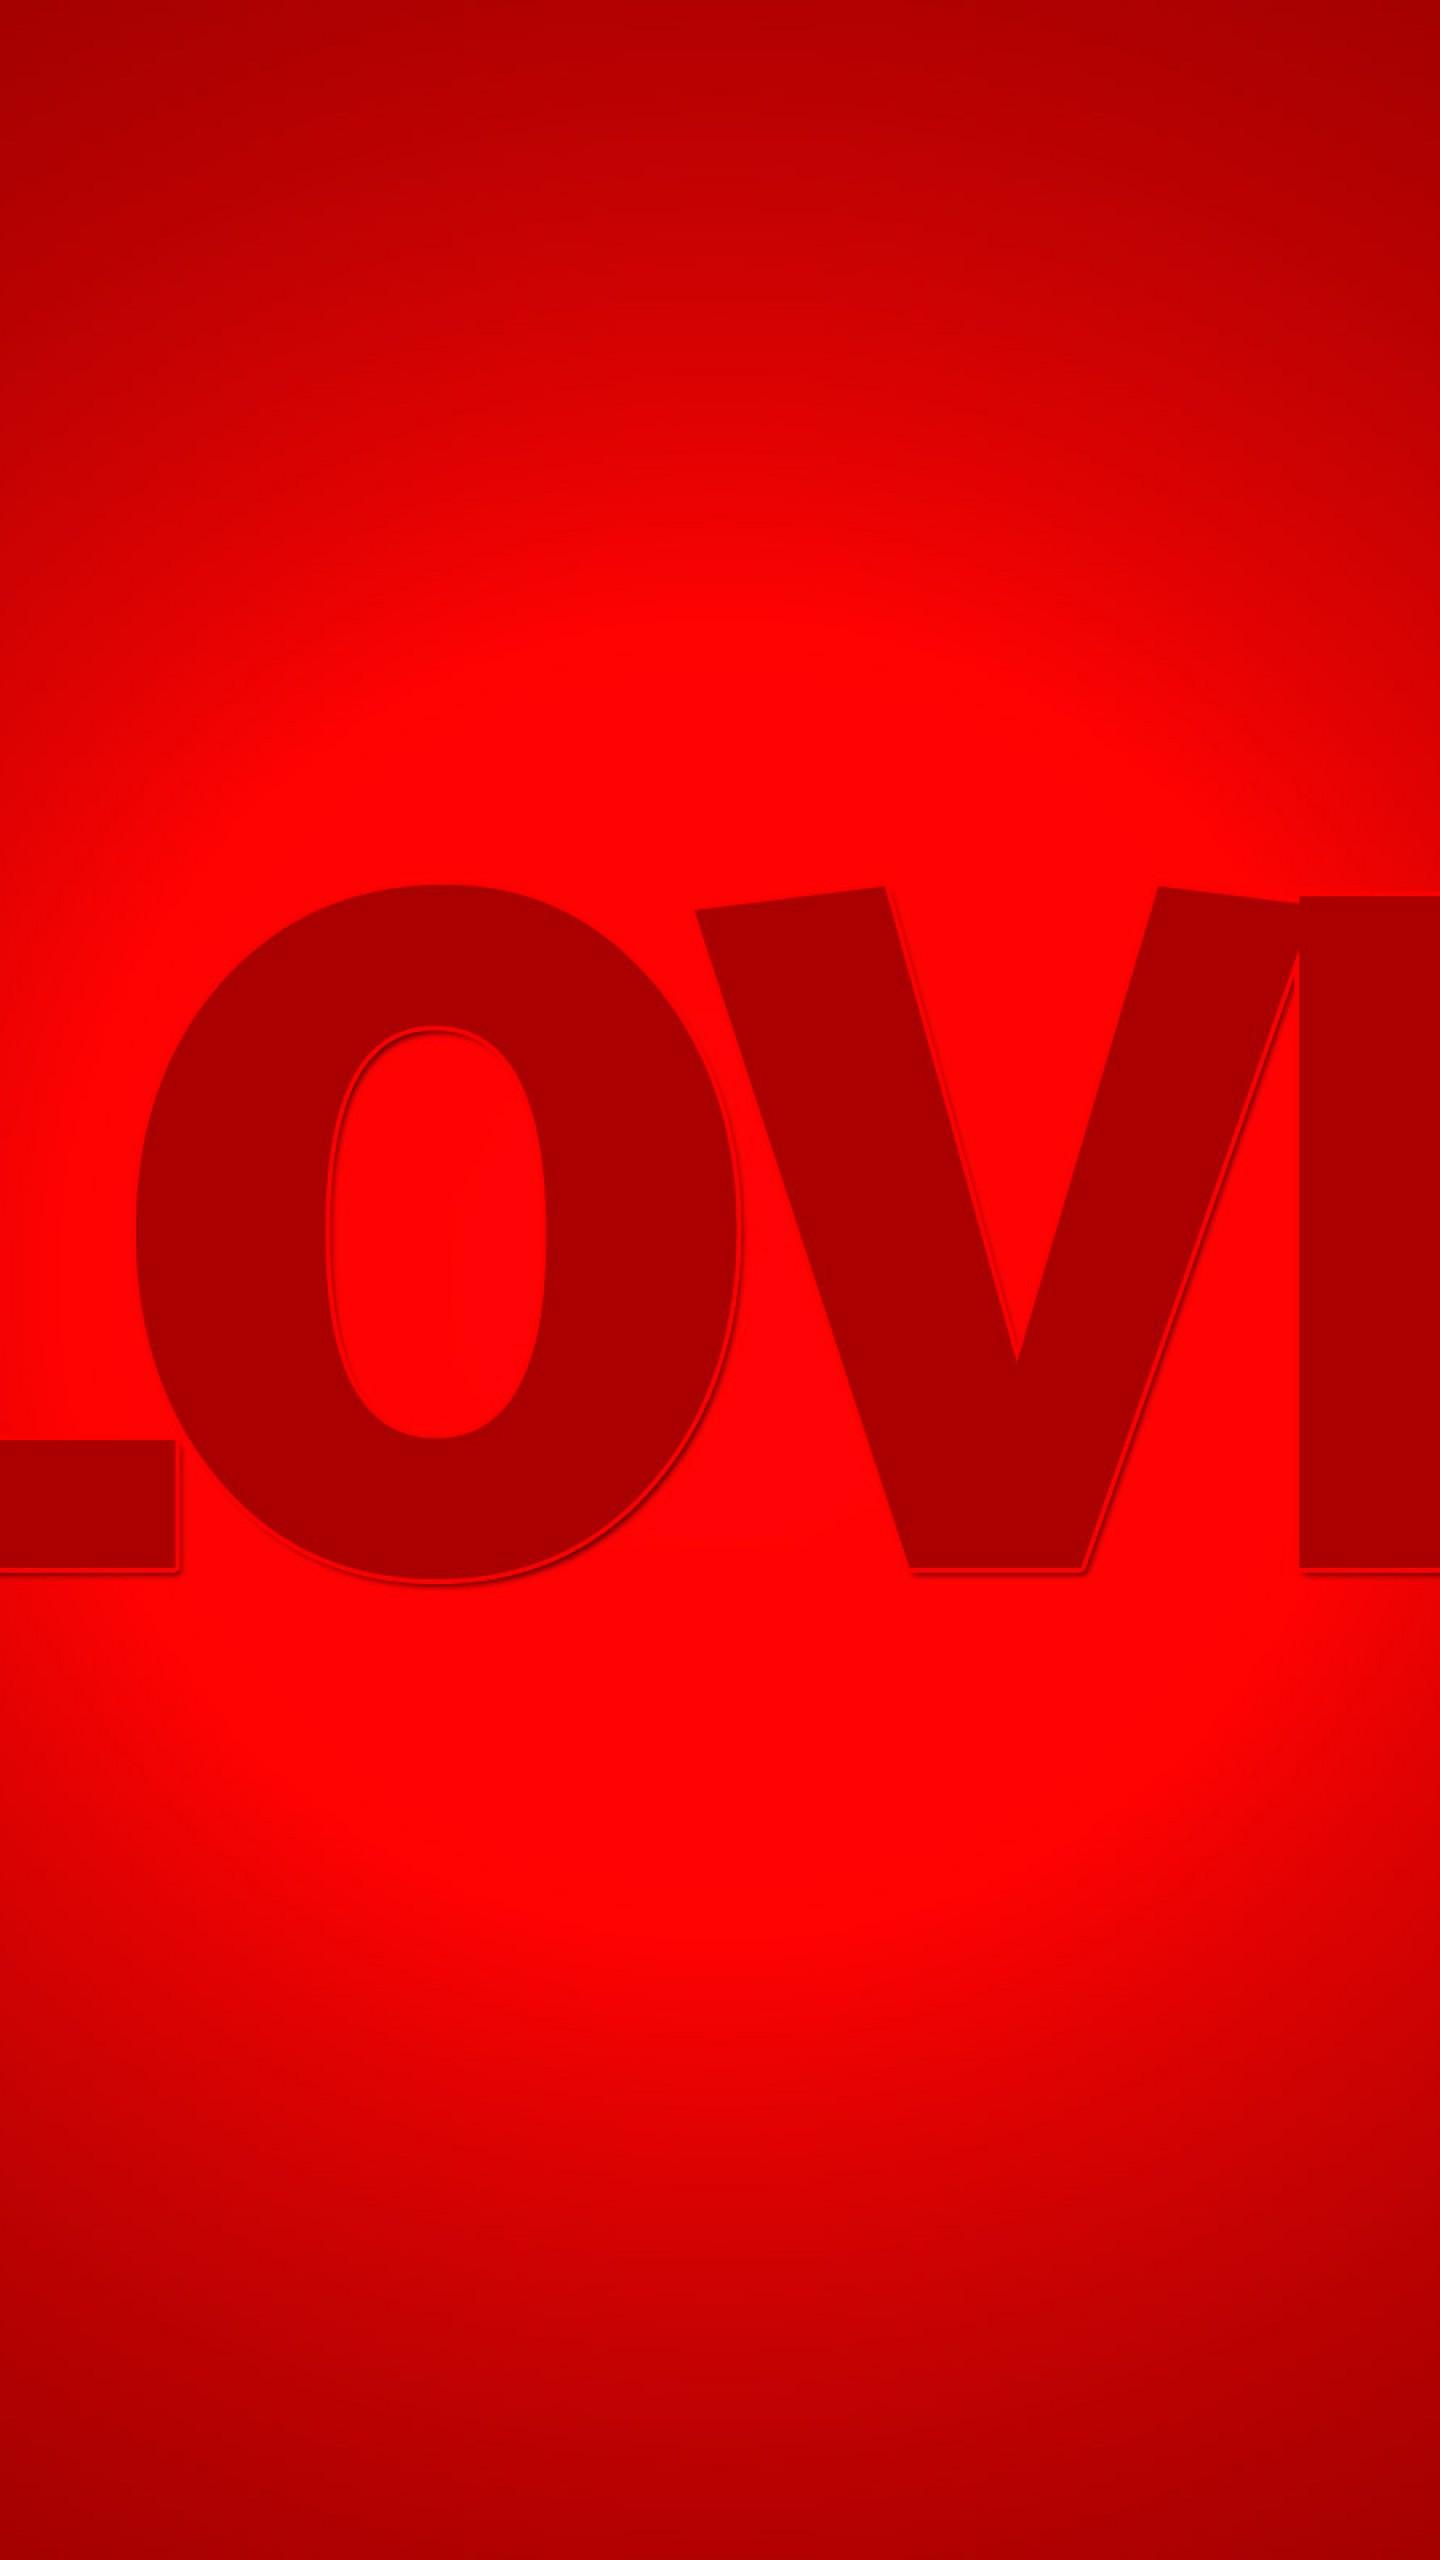 عکس زمینه صفحه قرمز عشق و love پس زمینه